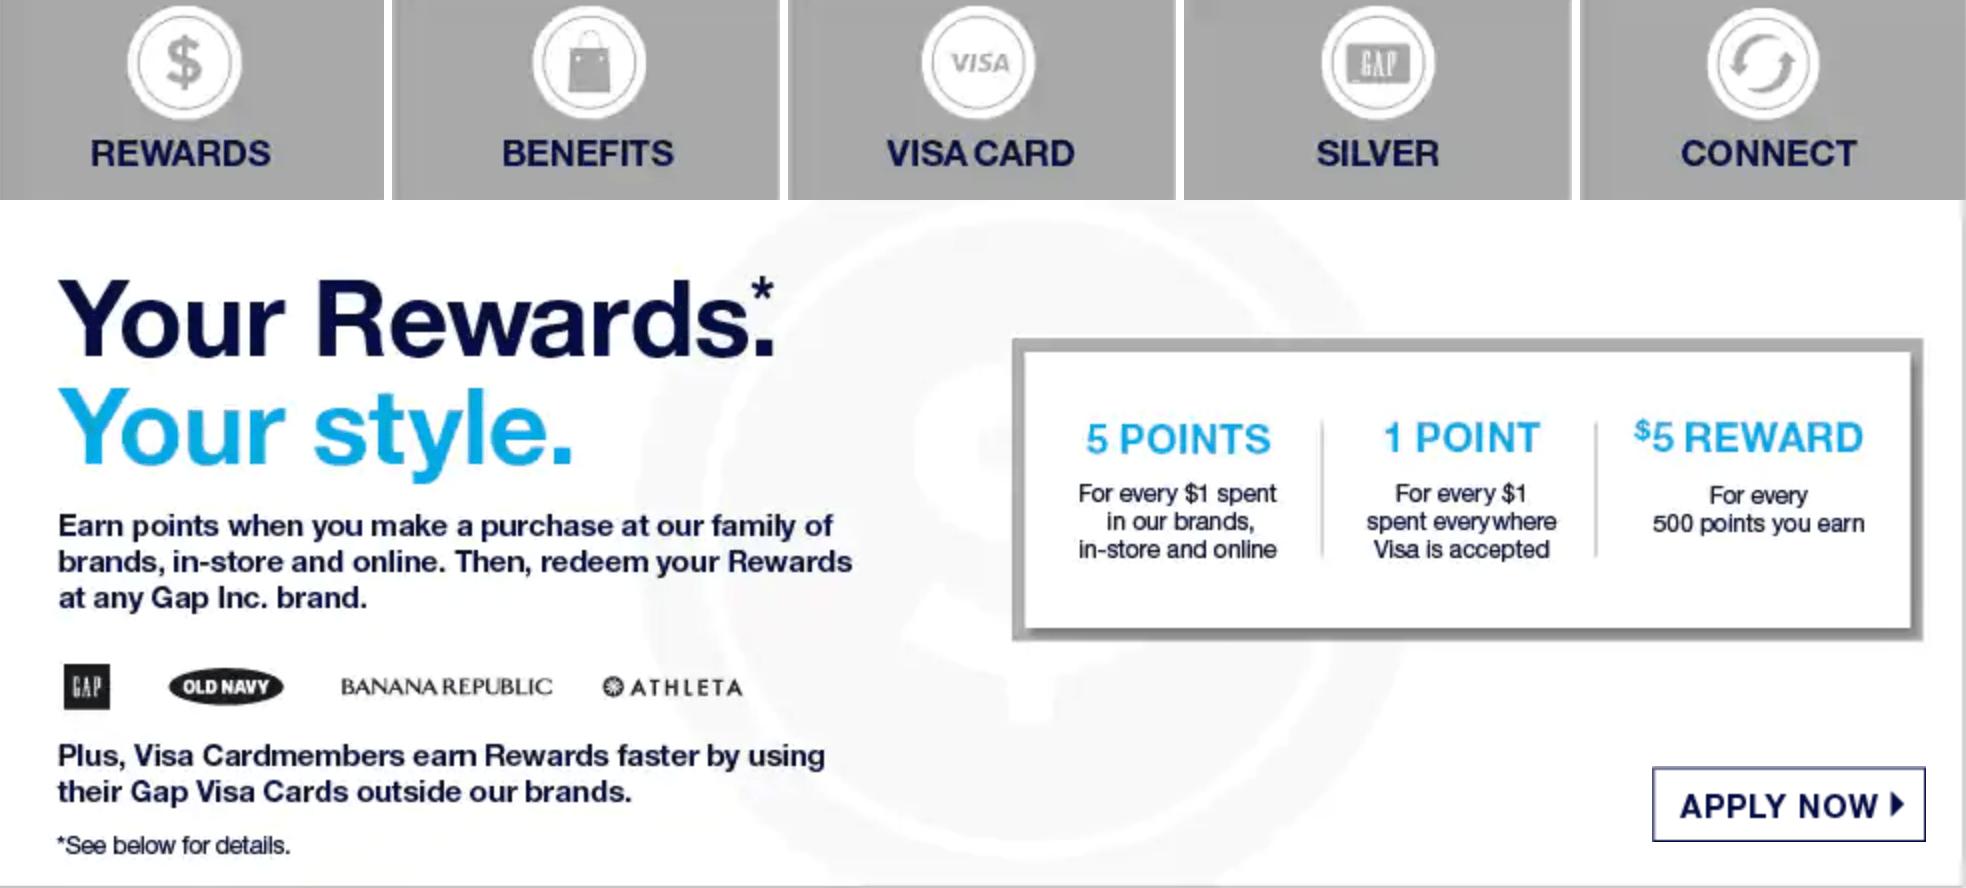 Gap Credit Card Login - www.gap.com Payment Customer Service